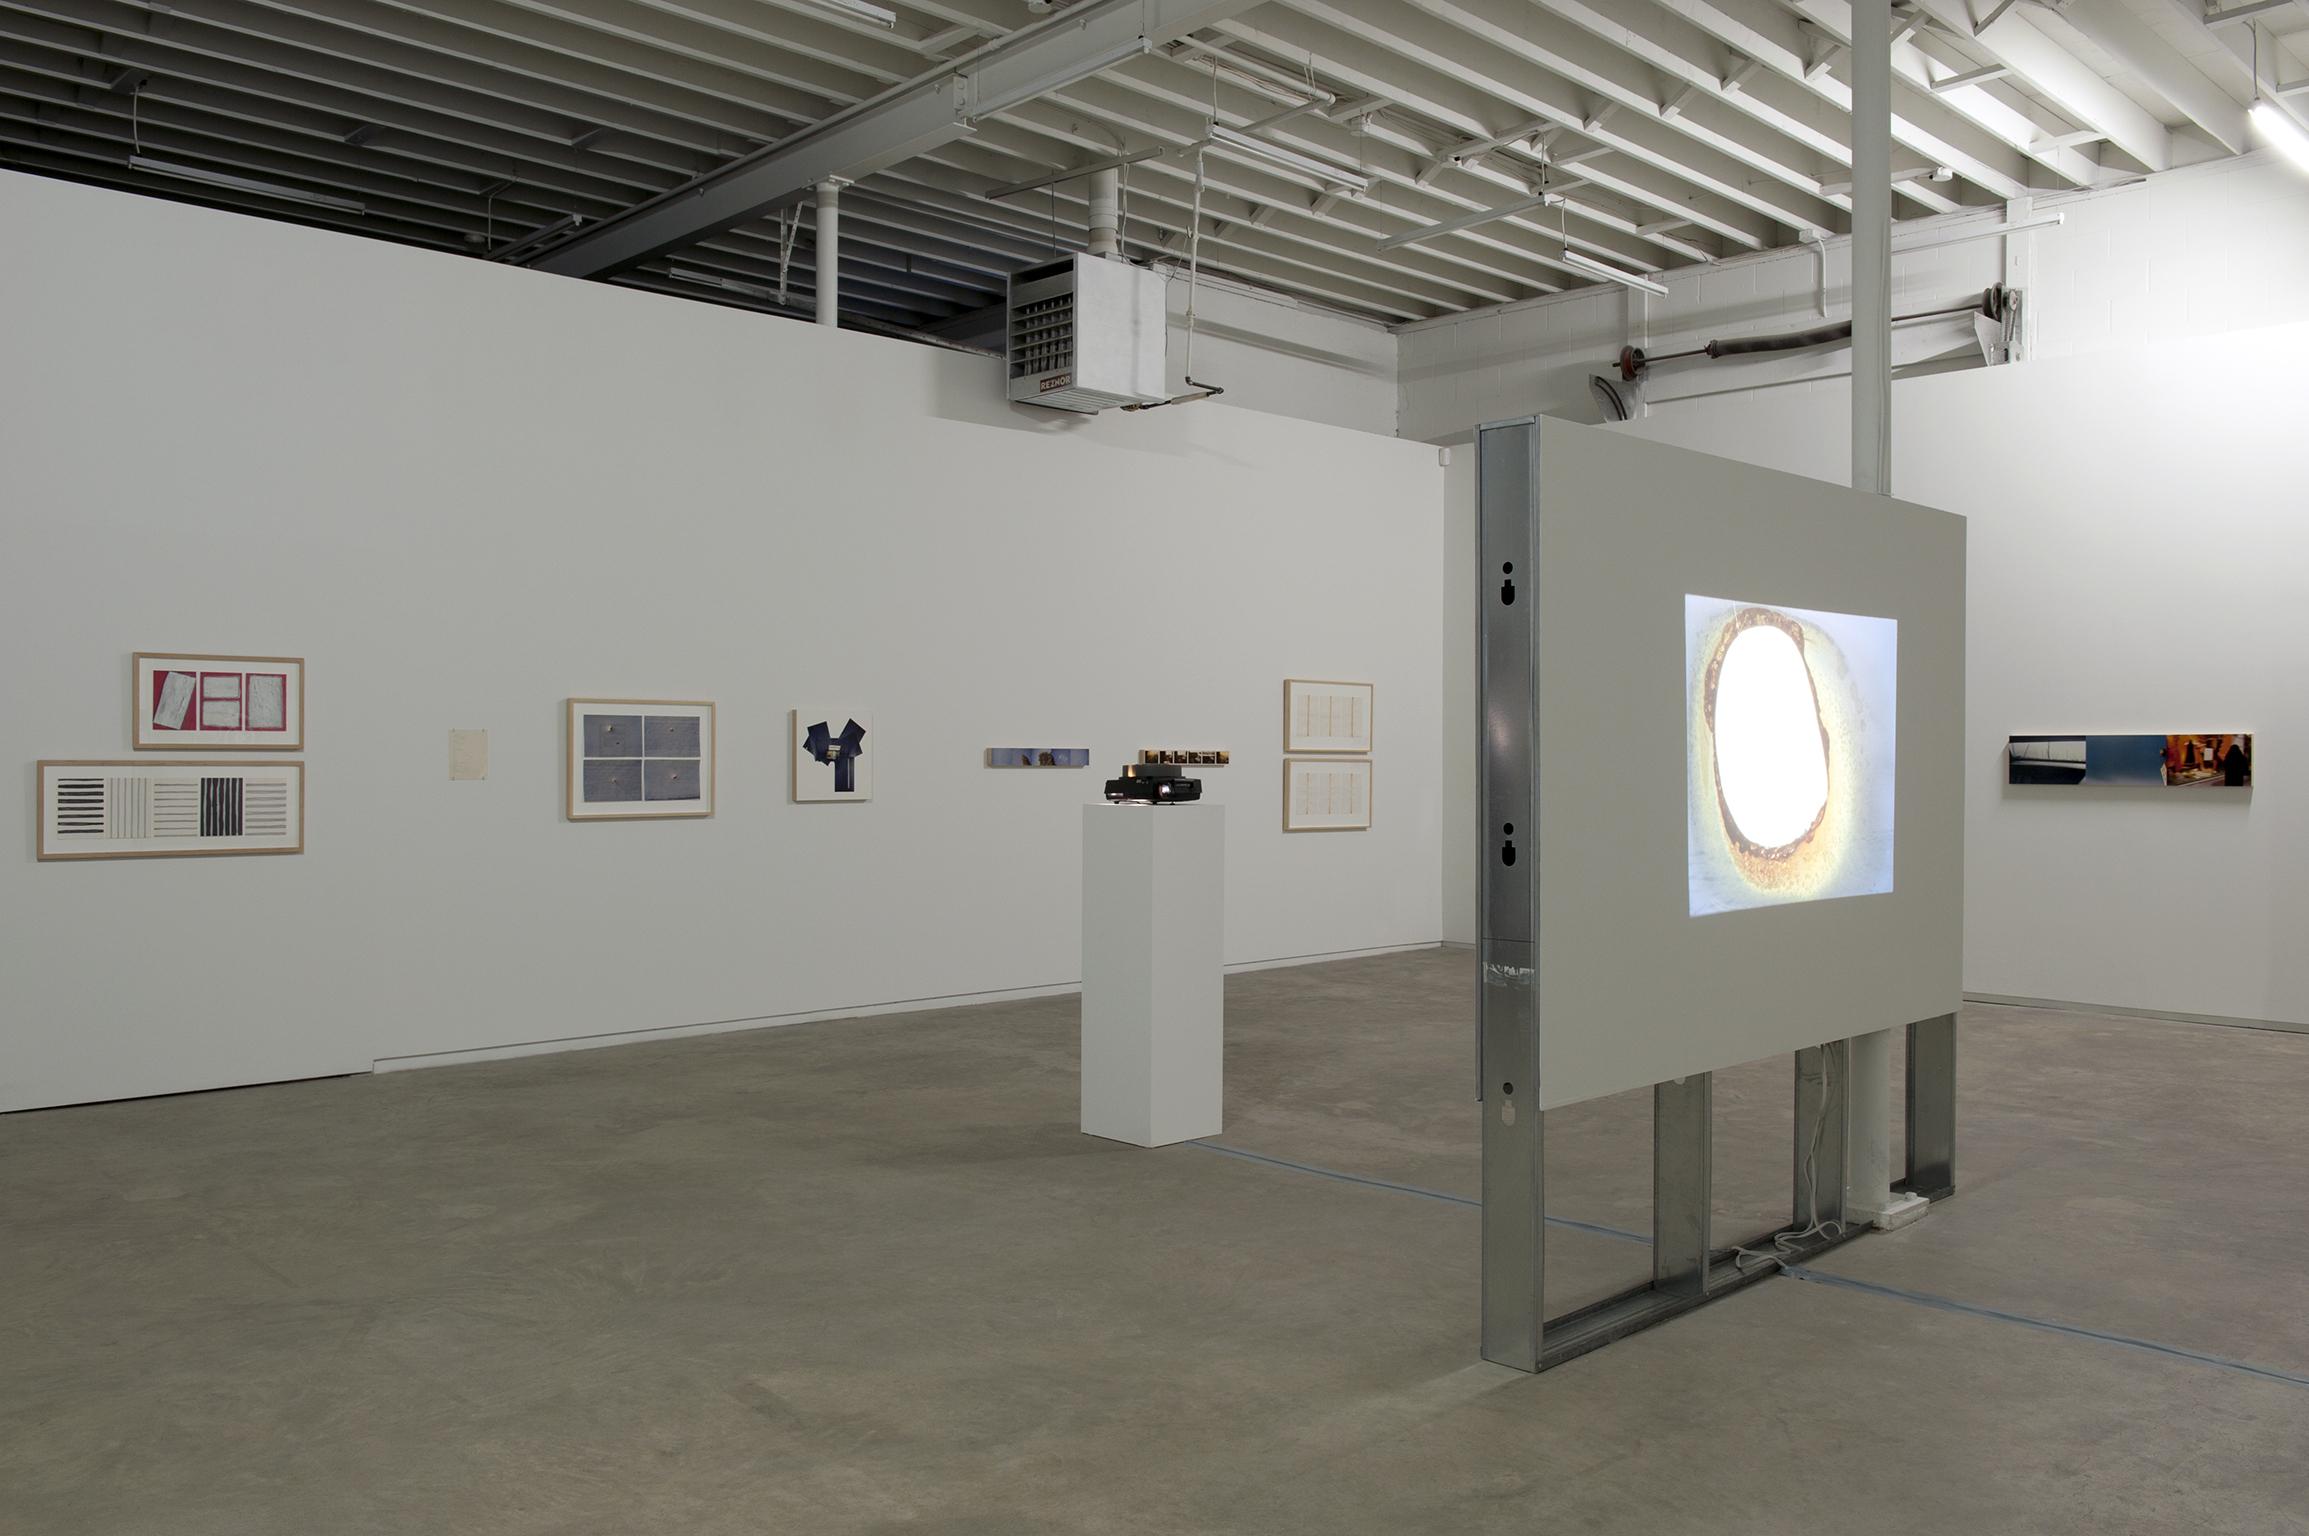 Robert Kleyn, installation view, Works 1969–1983, Catriona Jeffries, 2011 by